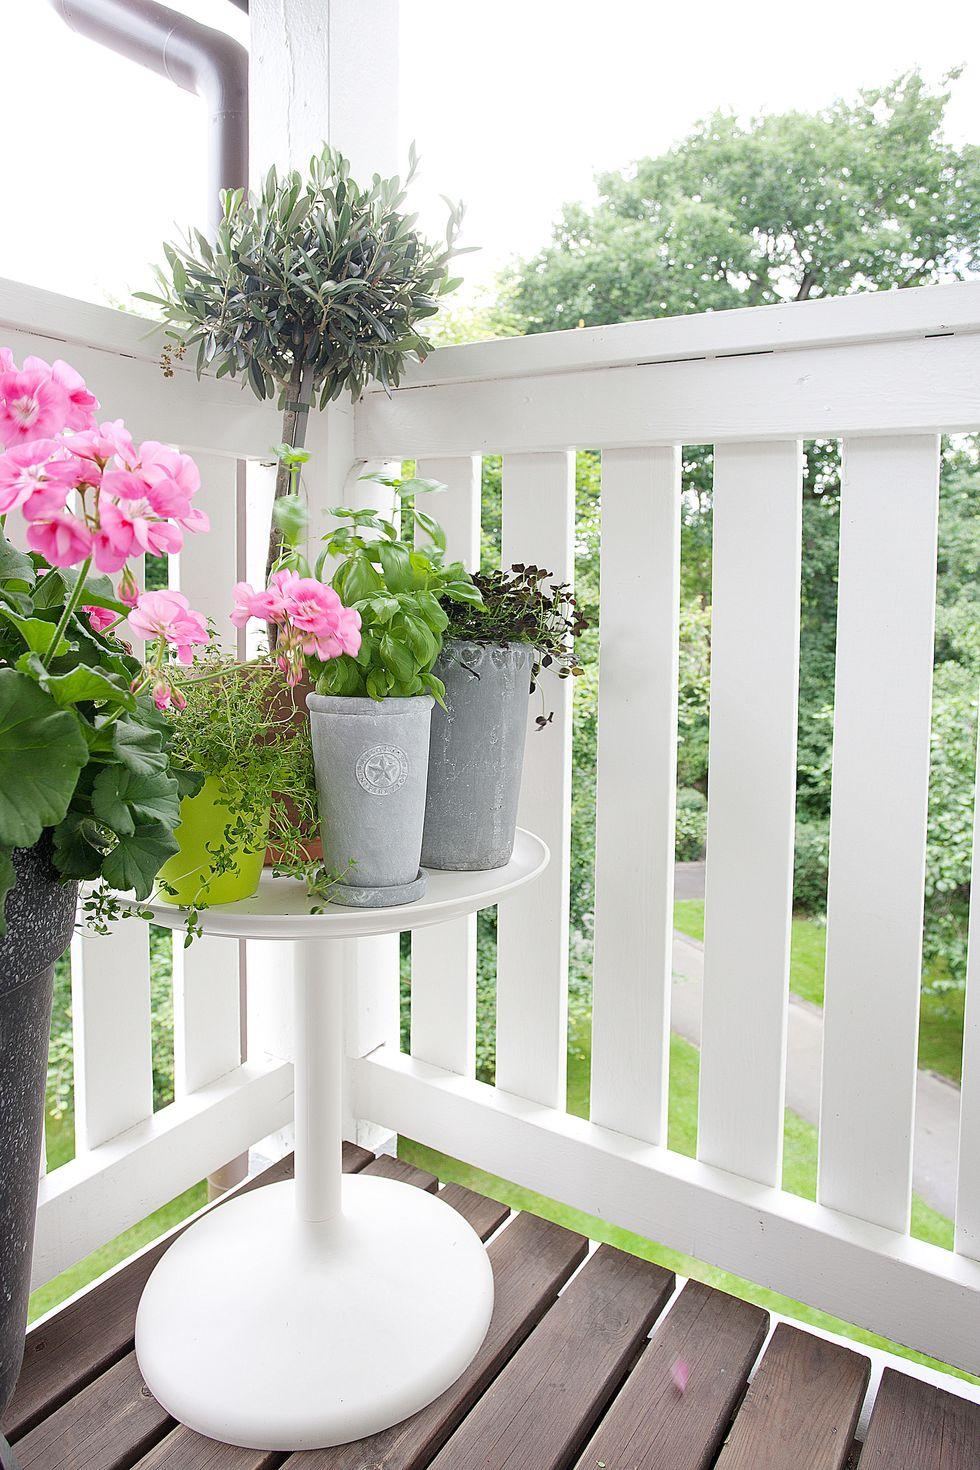 SÃ¥ här fÃ¥r du sommarens mysigaste balkong – Hemmets Journal